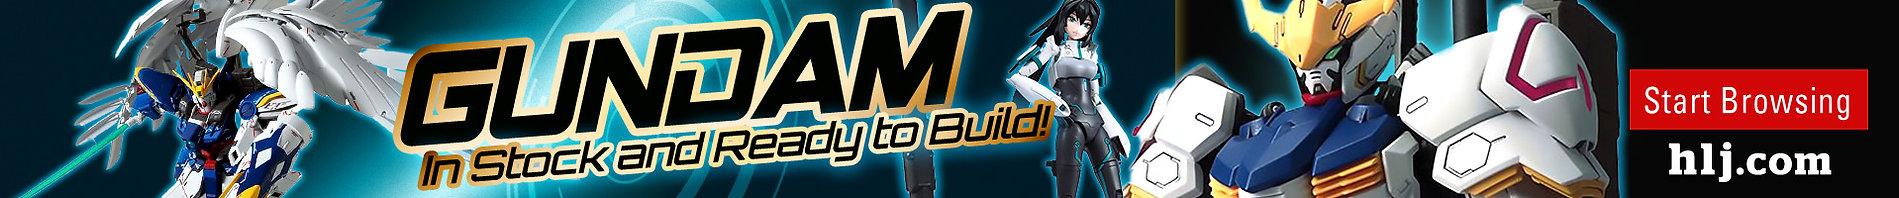 Gundam_New_Arrivals_2021_03_1920x200.jpg